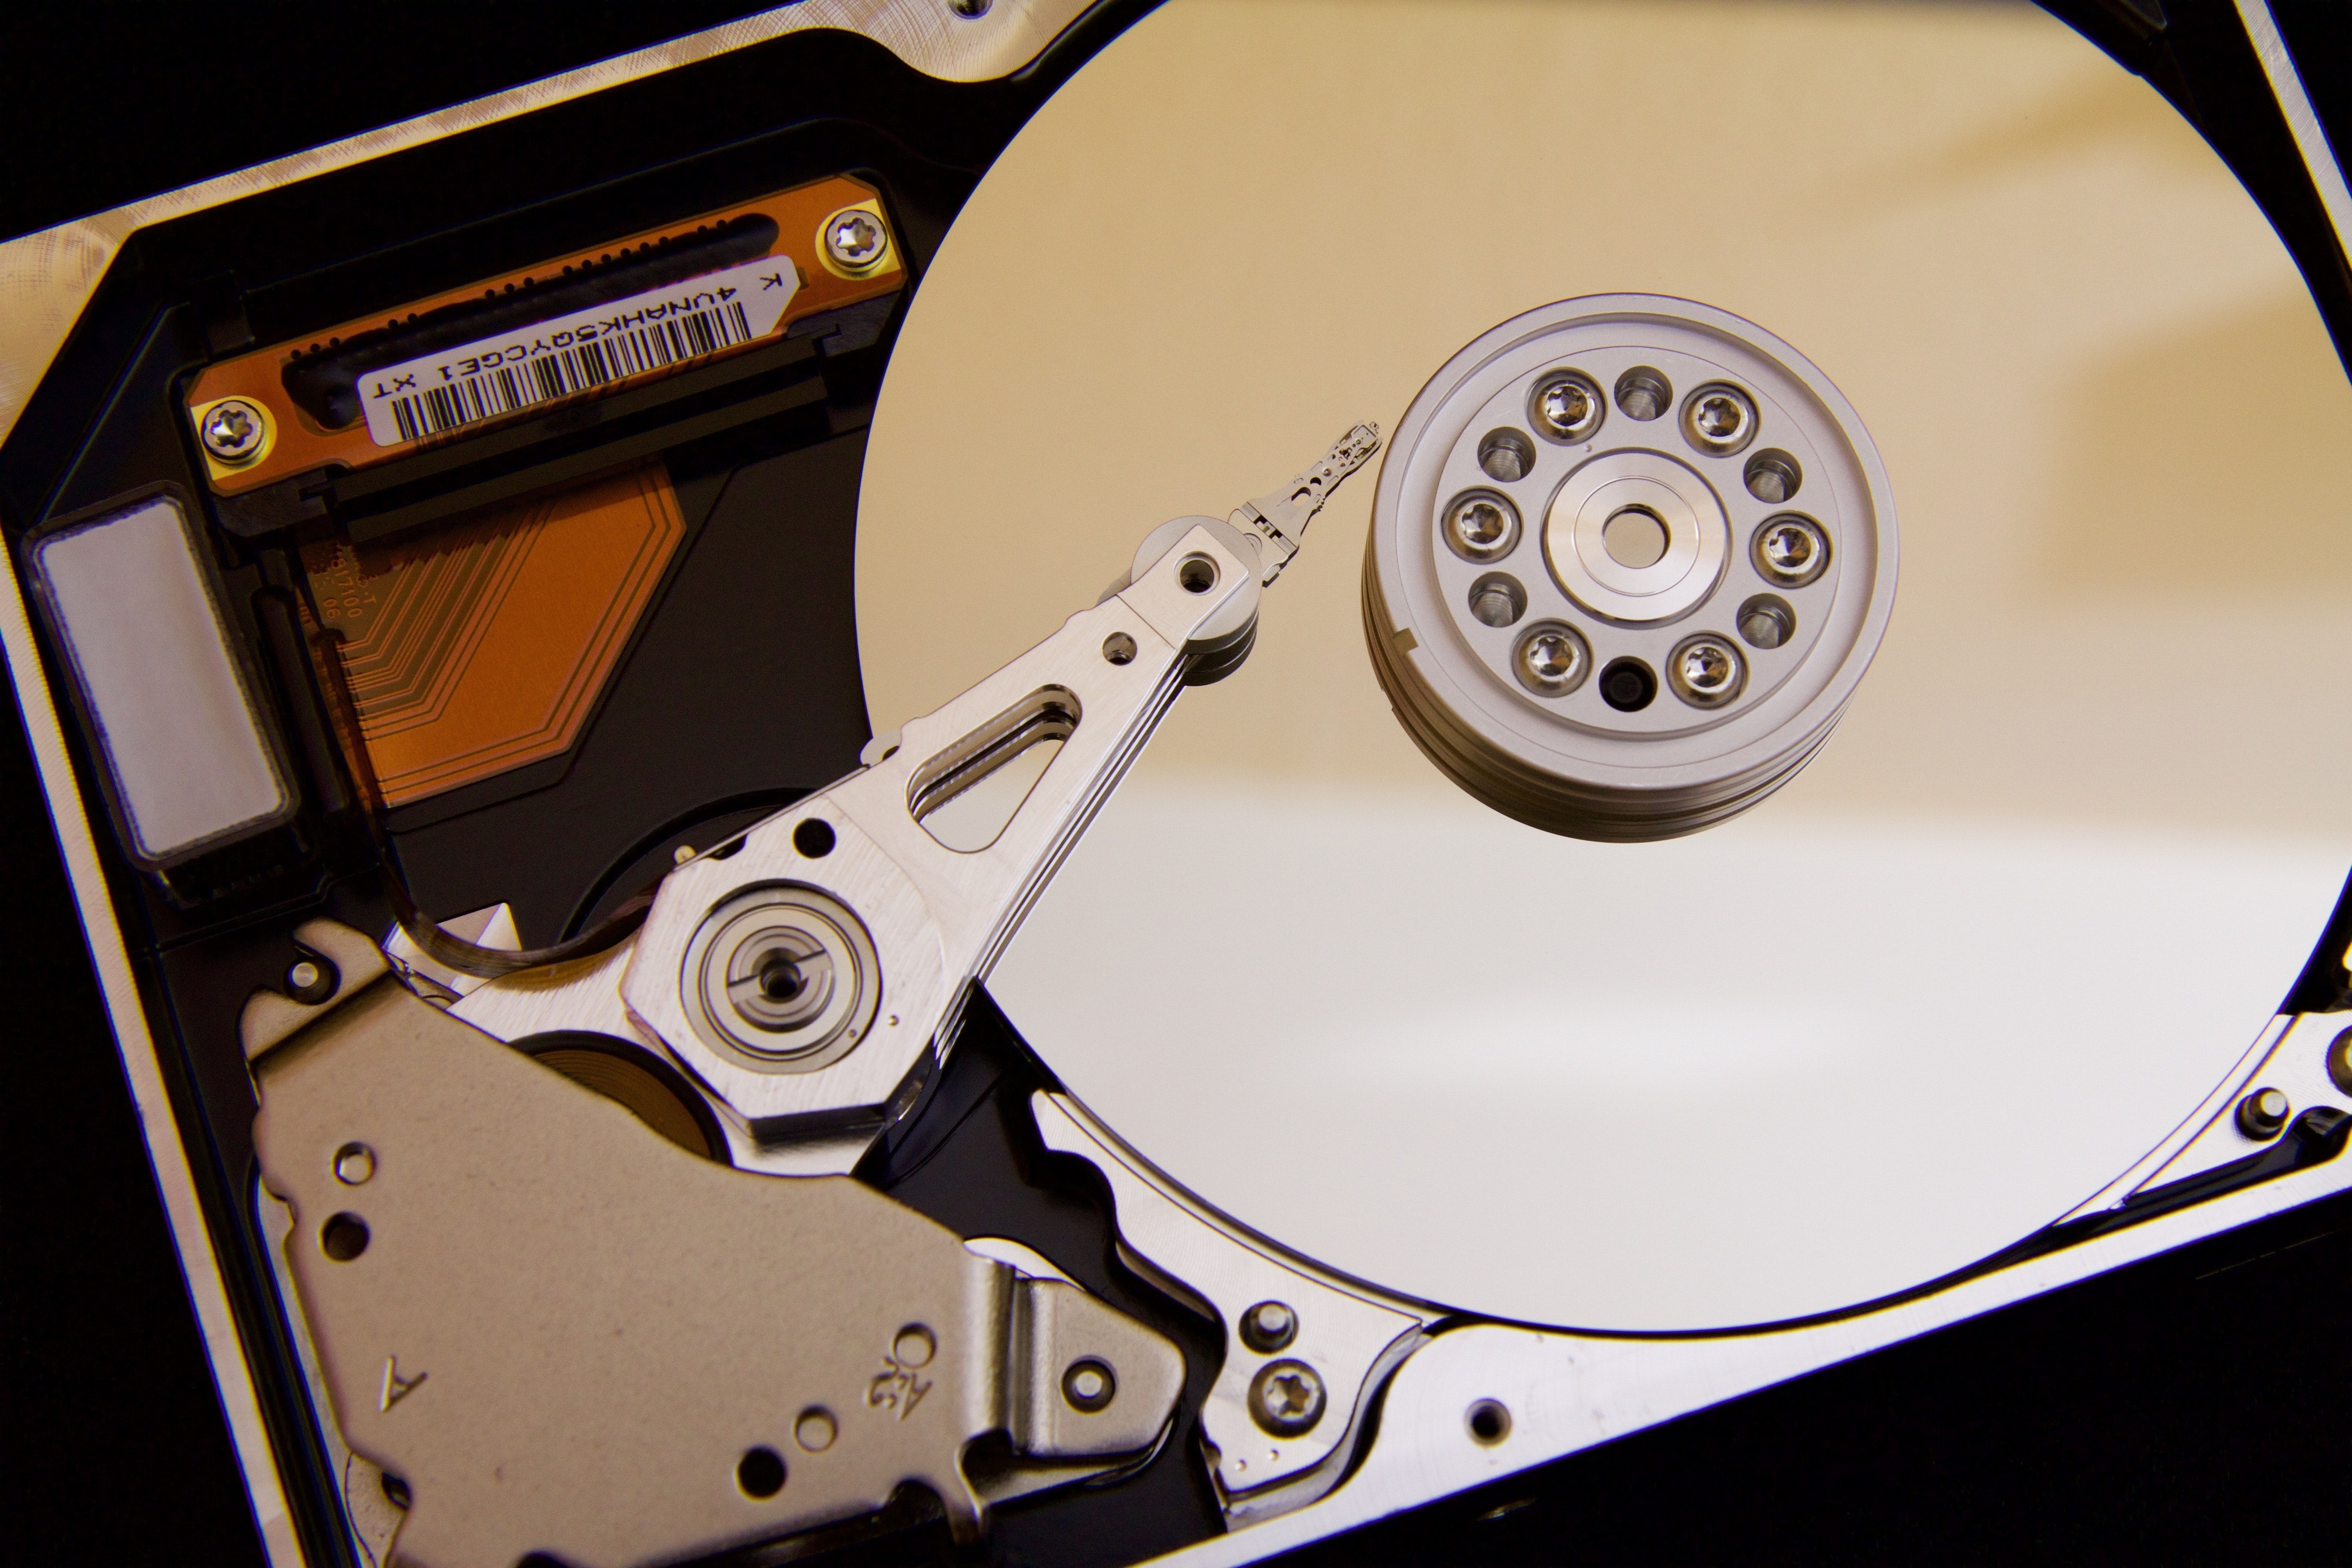 10 x Speed SSD upgrade | rosmancomputers.com.au